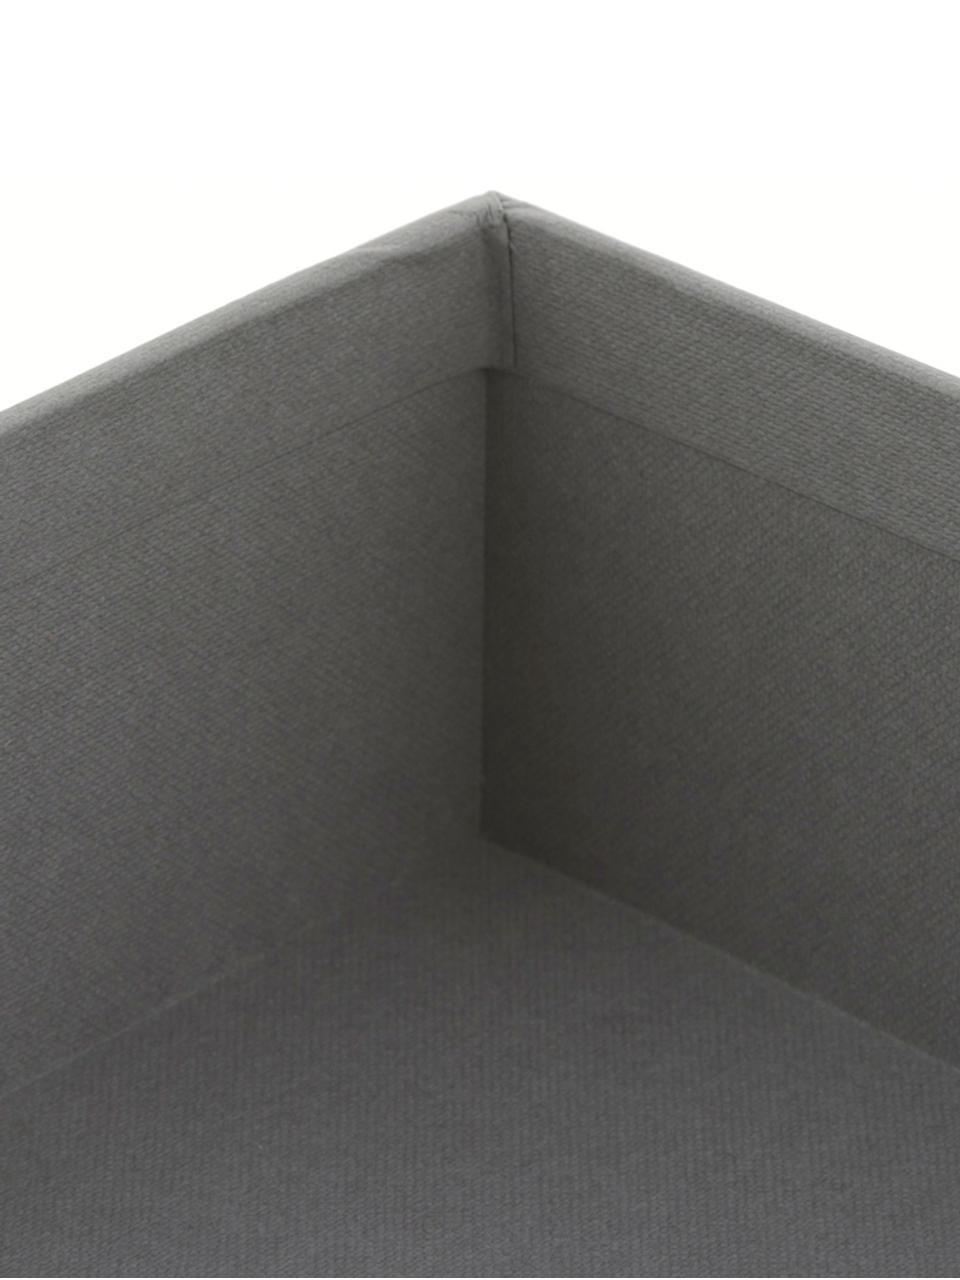 Dokumenten-Ablage Trey, Fester, laminierter Karton, Grau, 23 x 21 cm